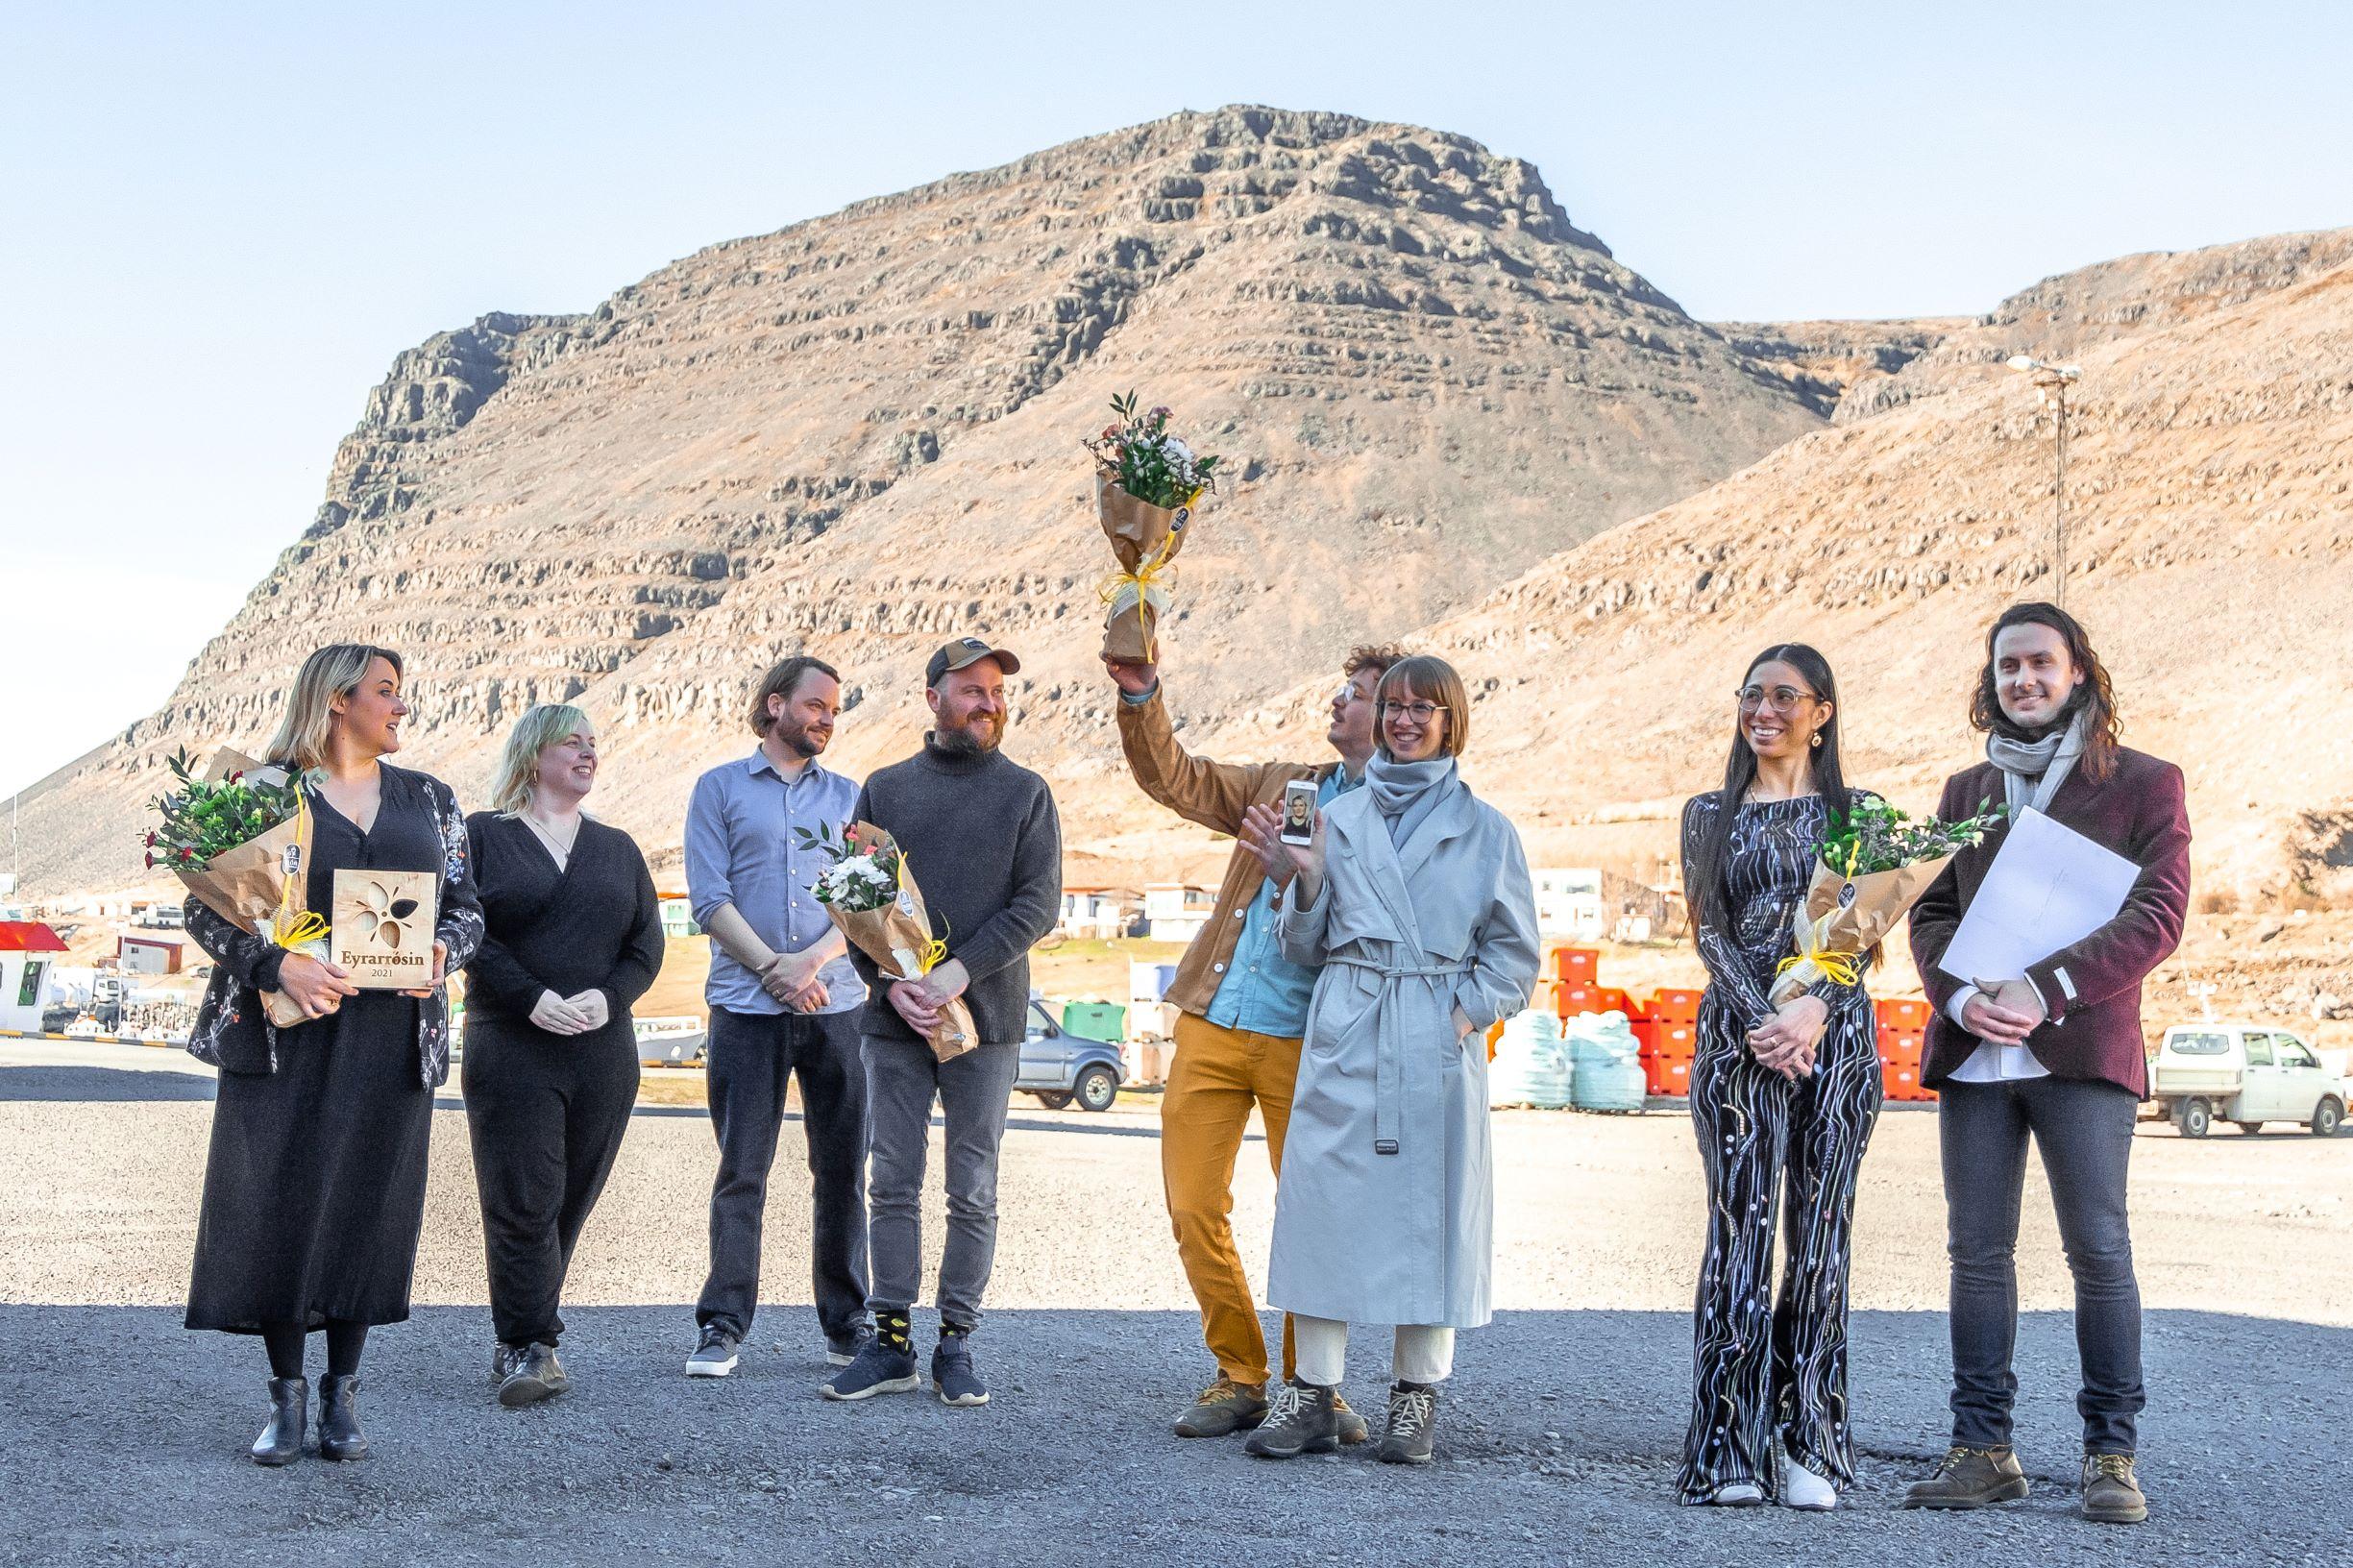 Recipients of the Eyrarrosin Encouragement Award pictured in Patreksfjordur in West Iceland celebrating their awards